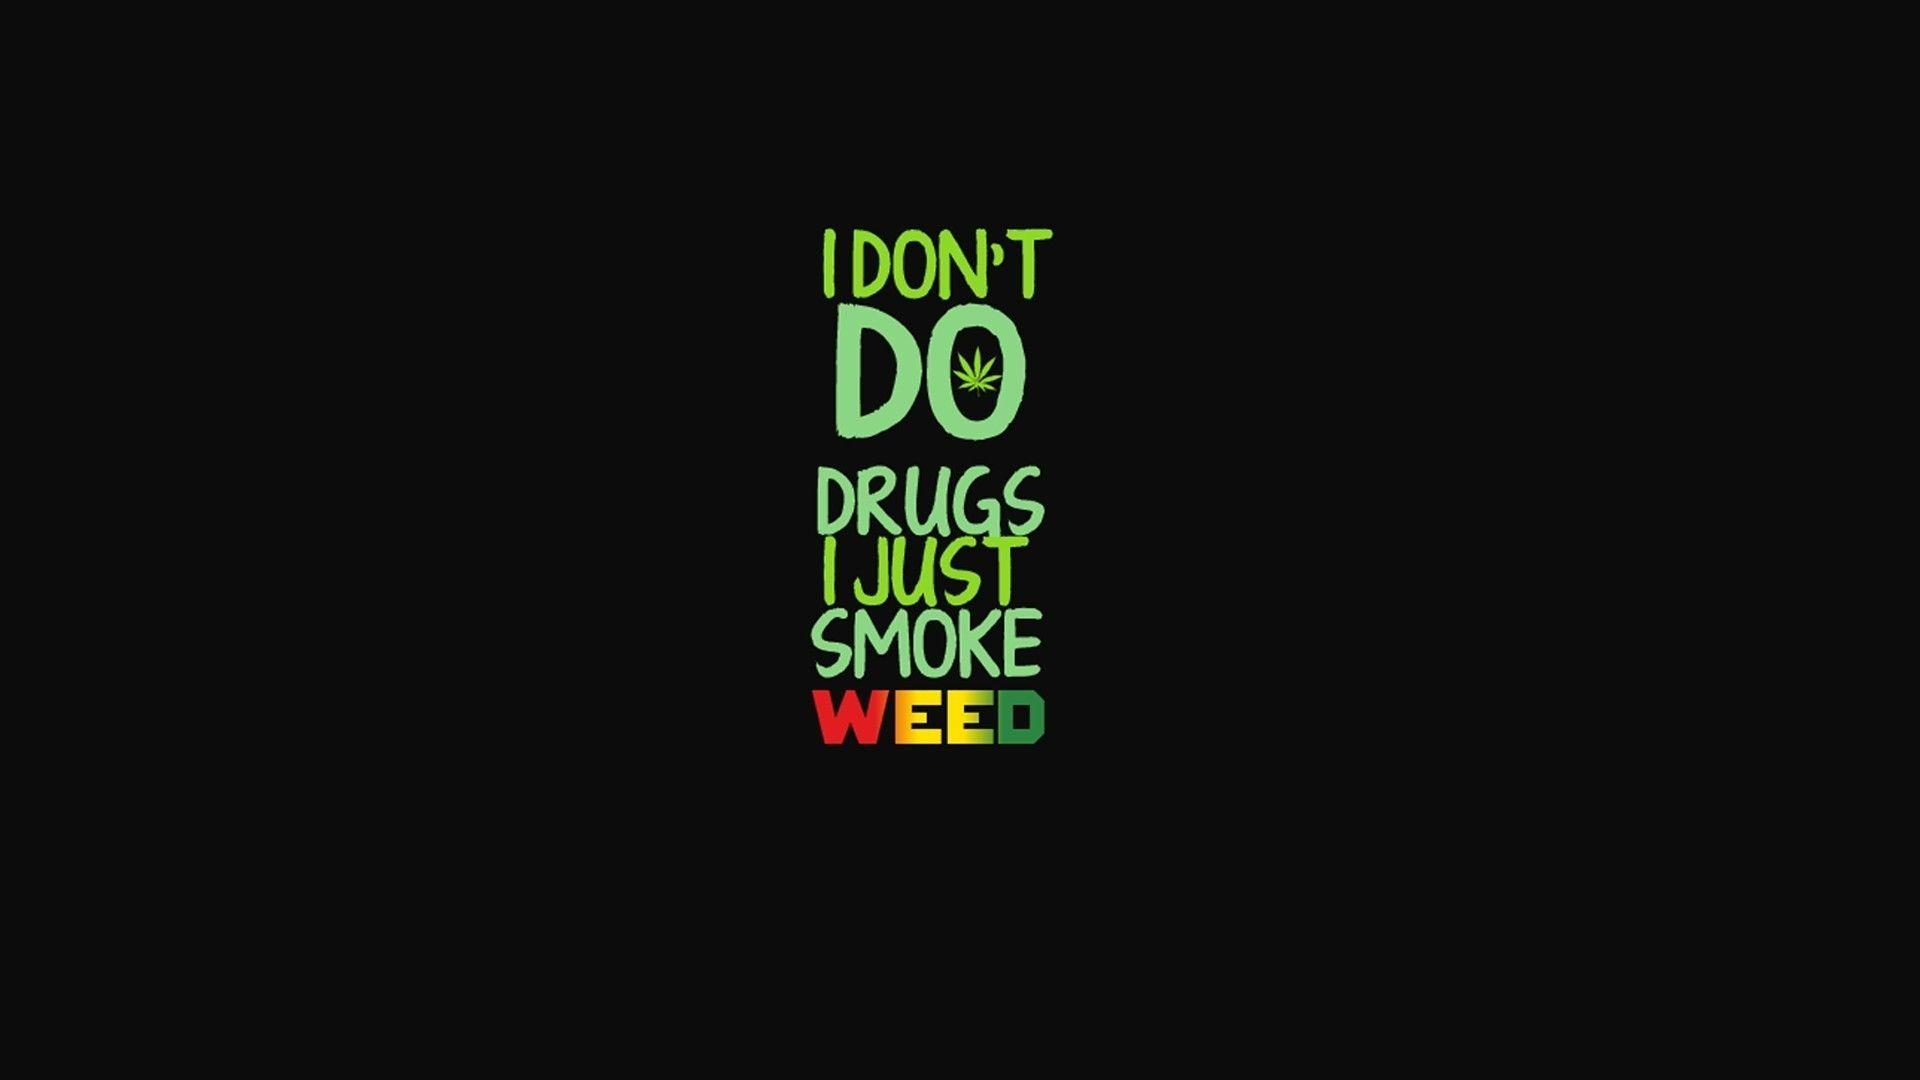 Smoking Weed Wallpapers - Wallpaper Cave